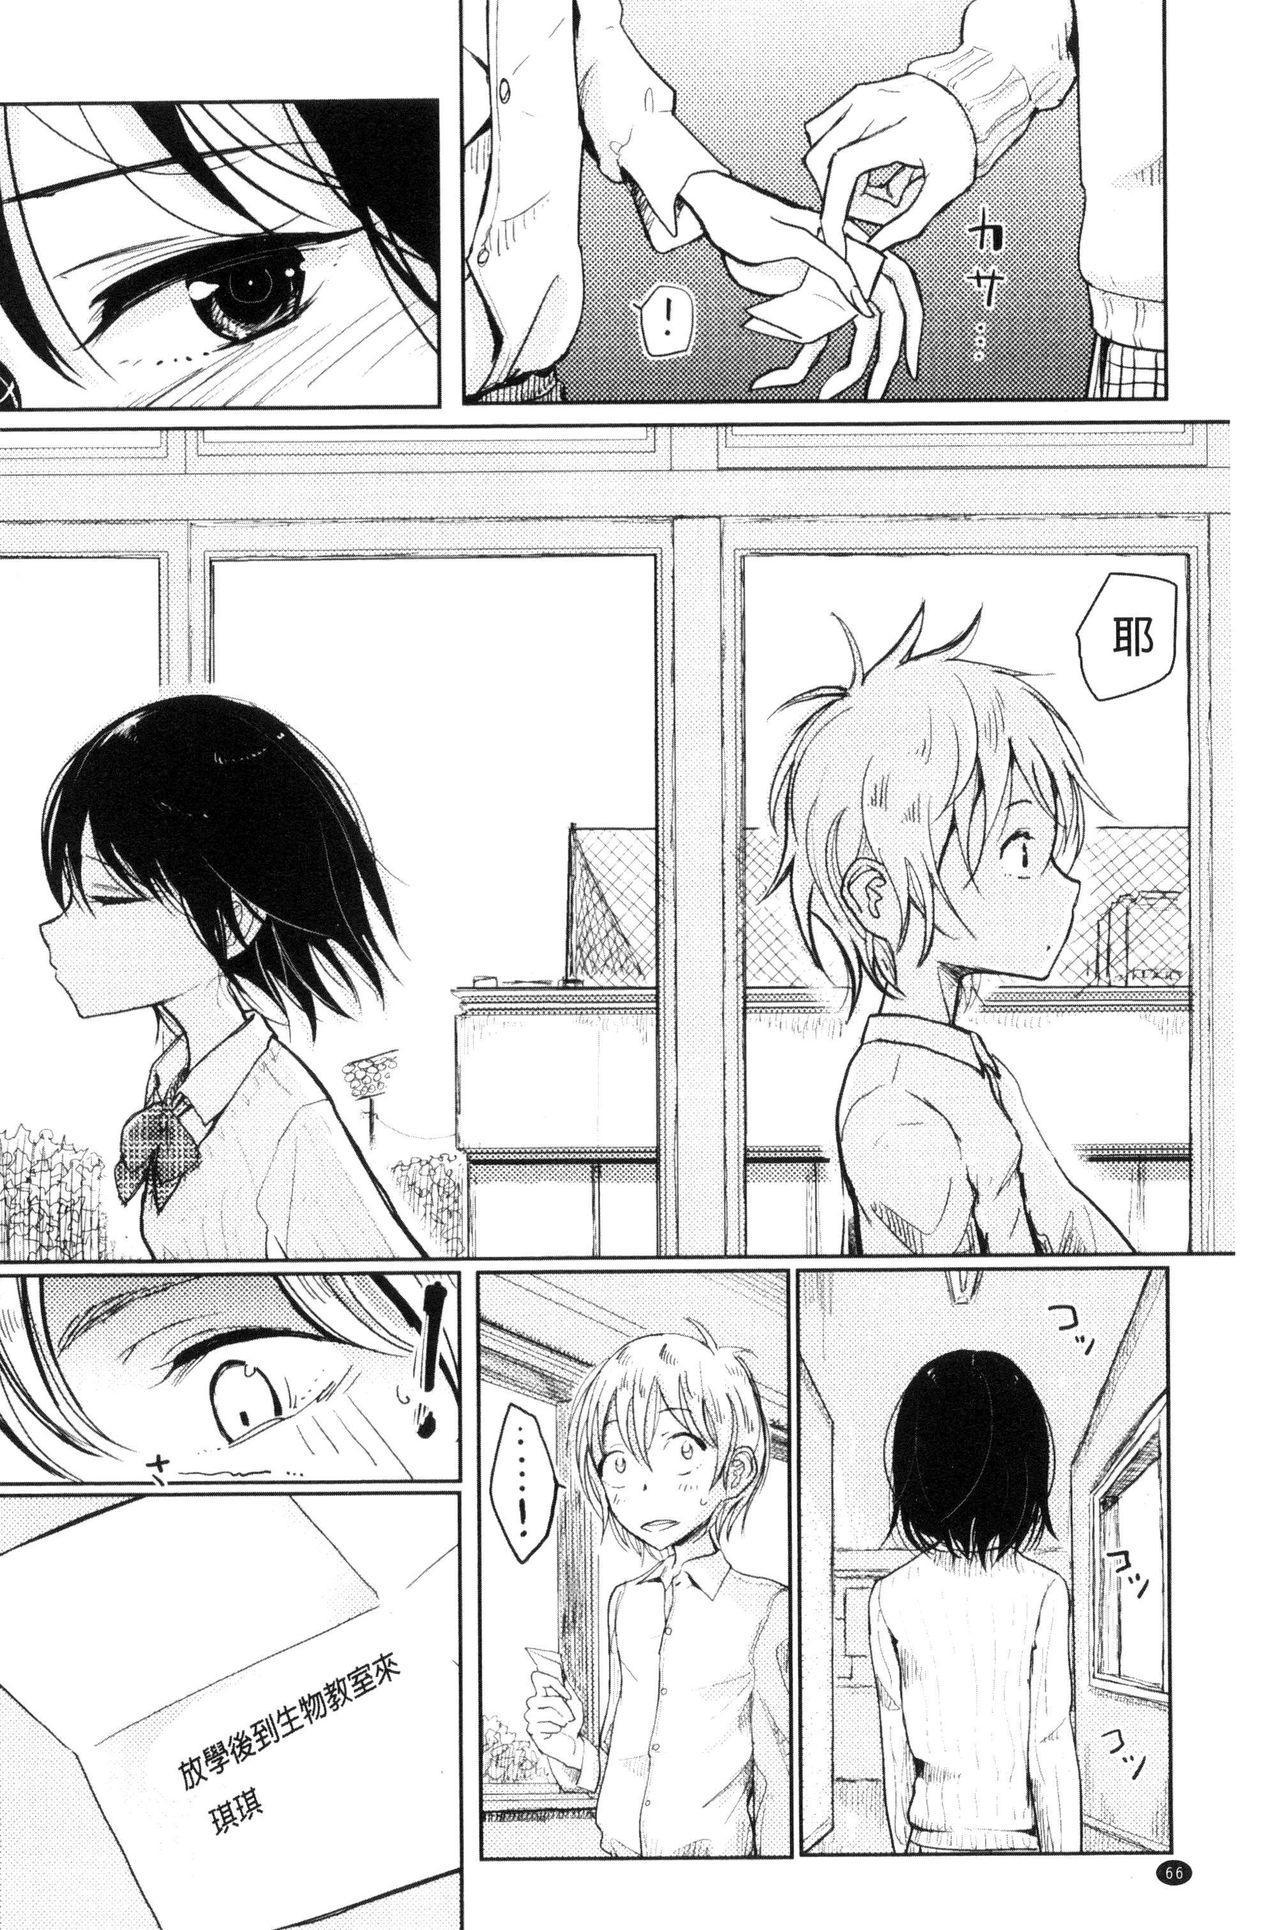 [Dhibi] Sono Yubisaki de Korogashite - Please Caress it at the Finger-tip. [Chinese] 67